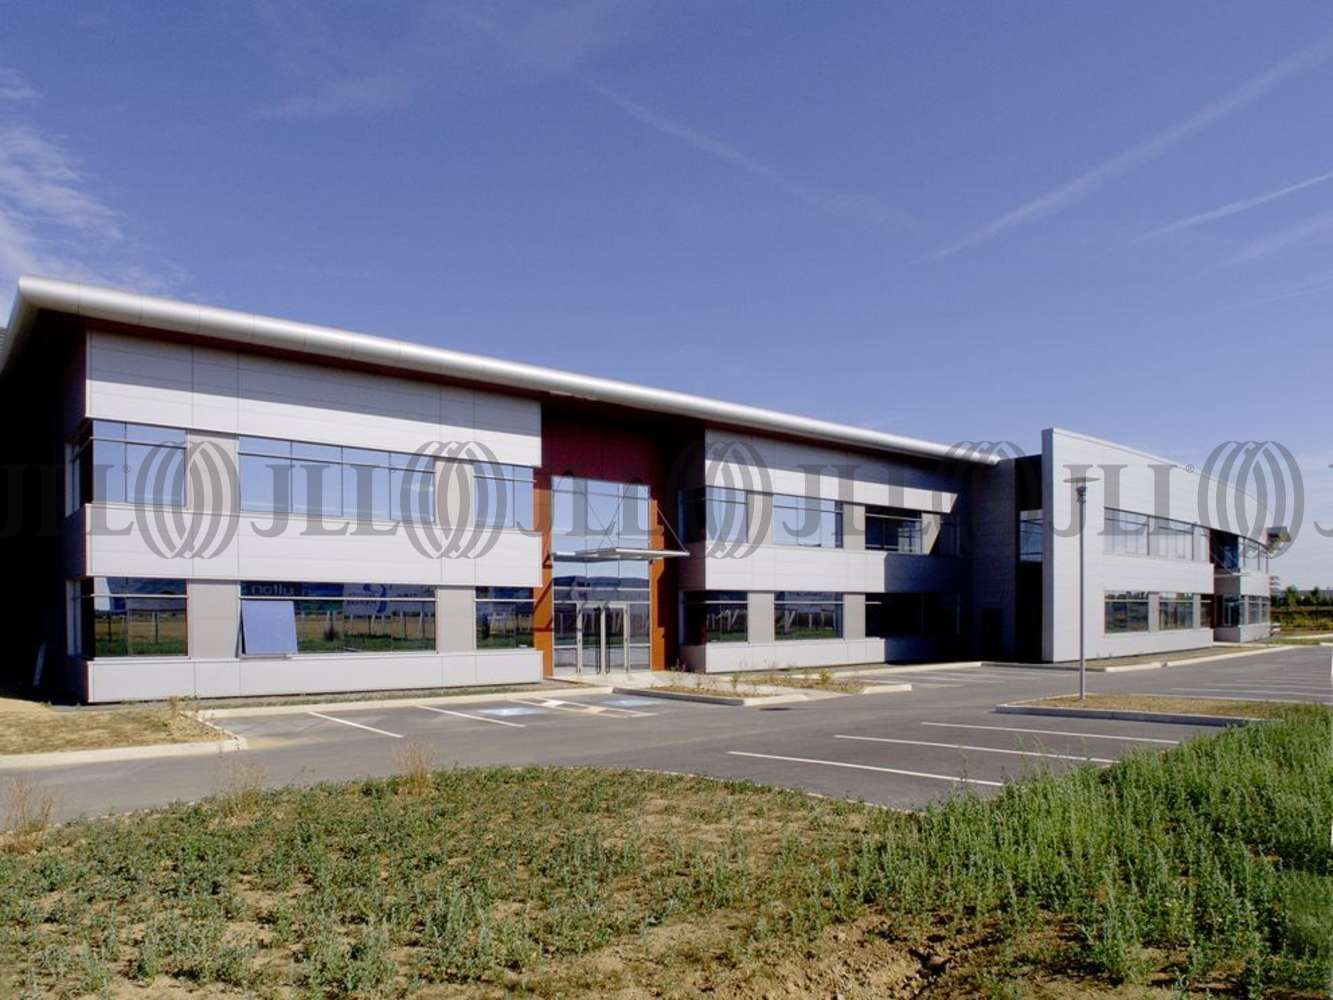 Activités/entrepôt Lieusaint, 77127 - PERIPARK BATIMENT 1 - 9445545